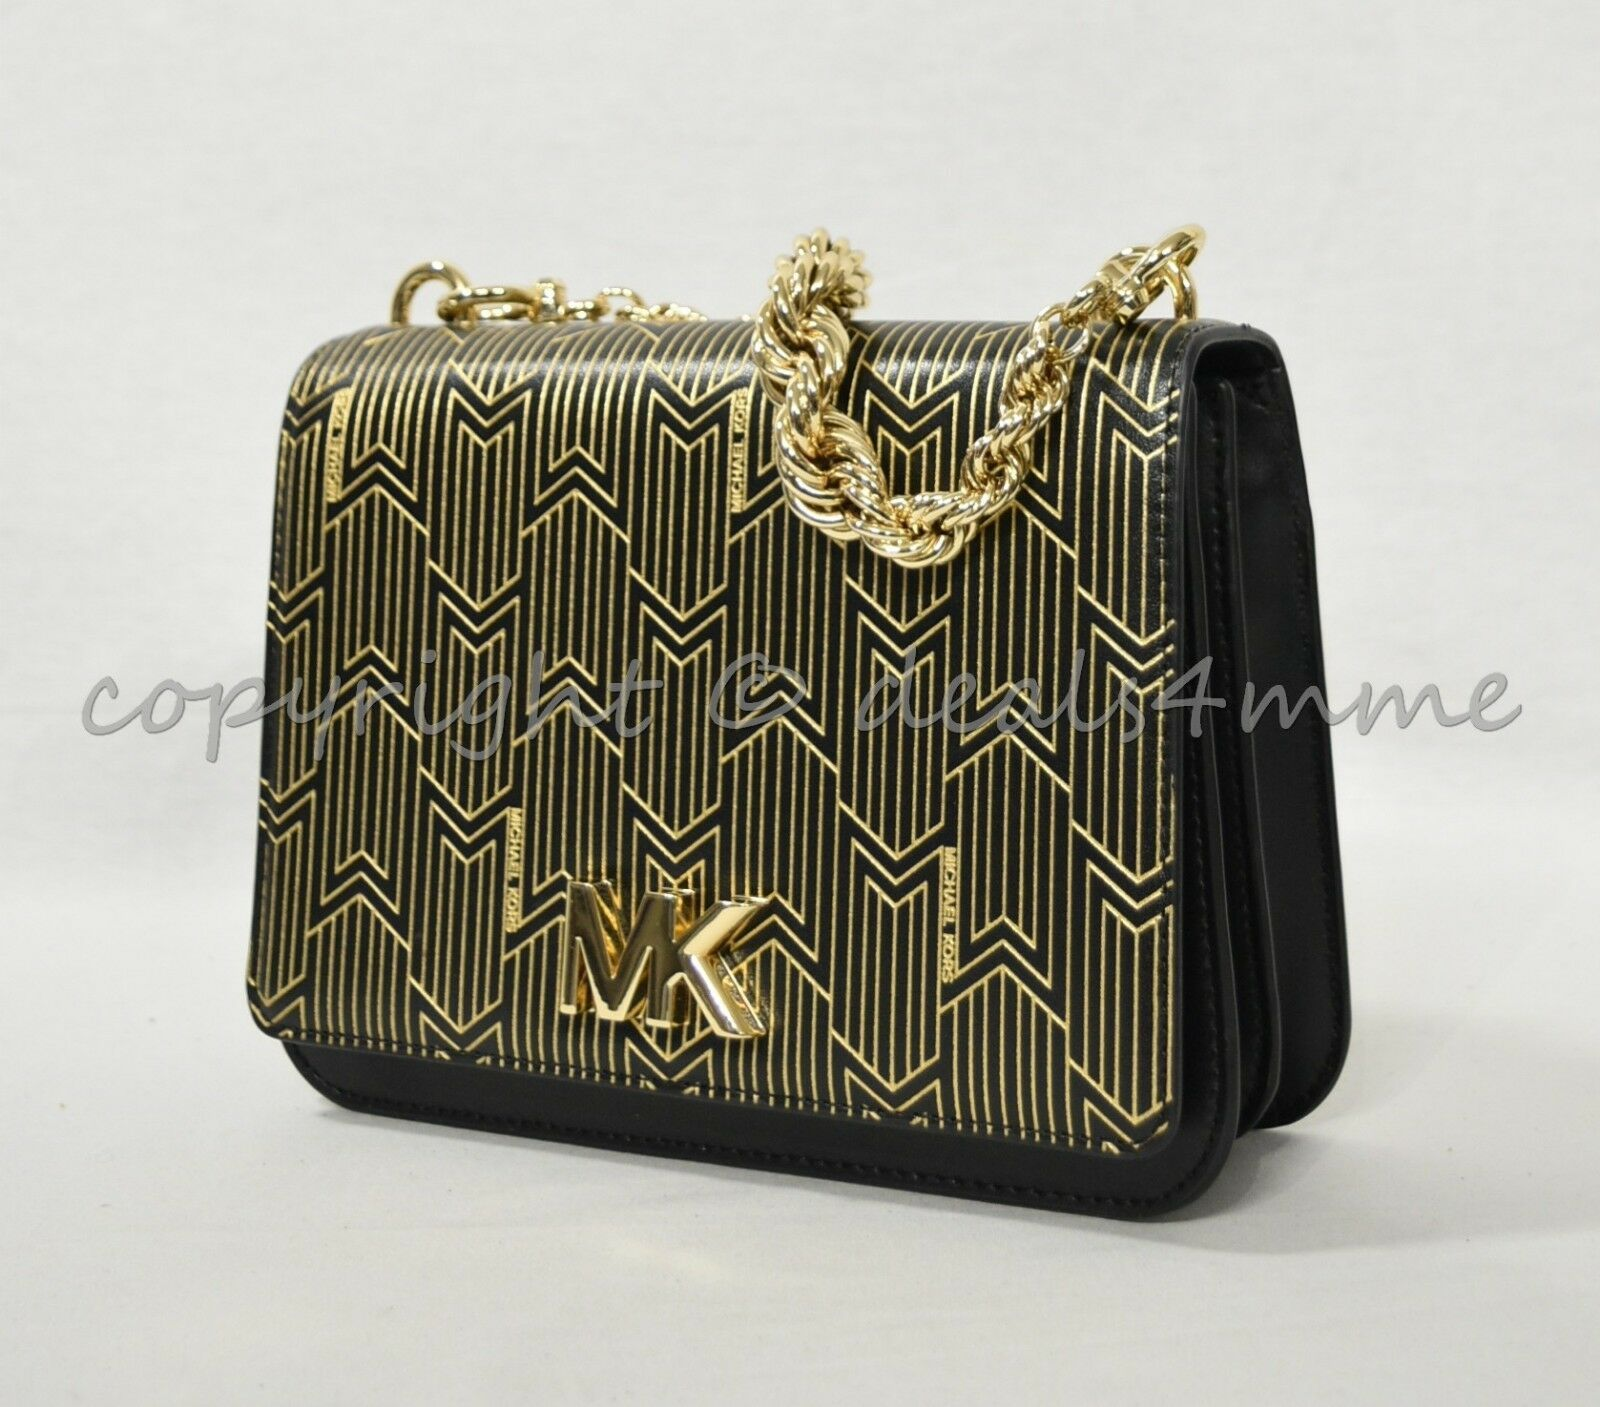 e94104a81e40 NWT Michael Kors 30H8MOXL7M Mott Metallic Deco Leather Satchel / Crossbody  Black